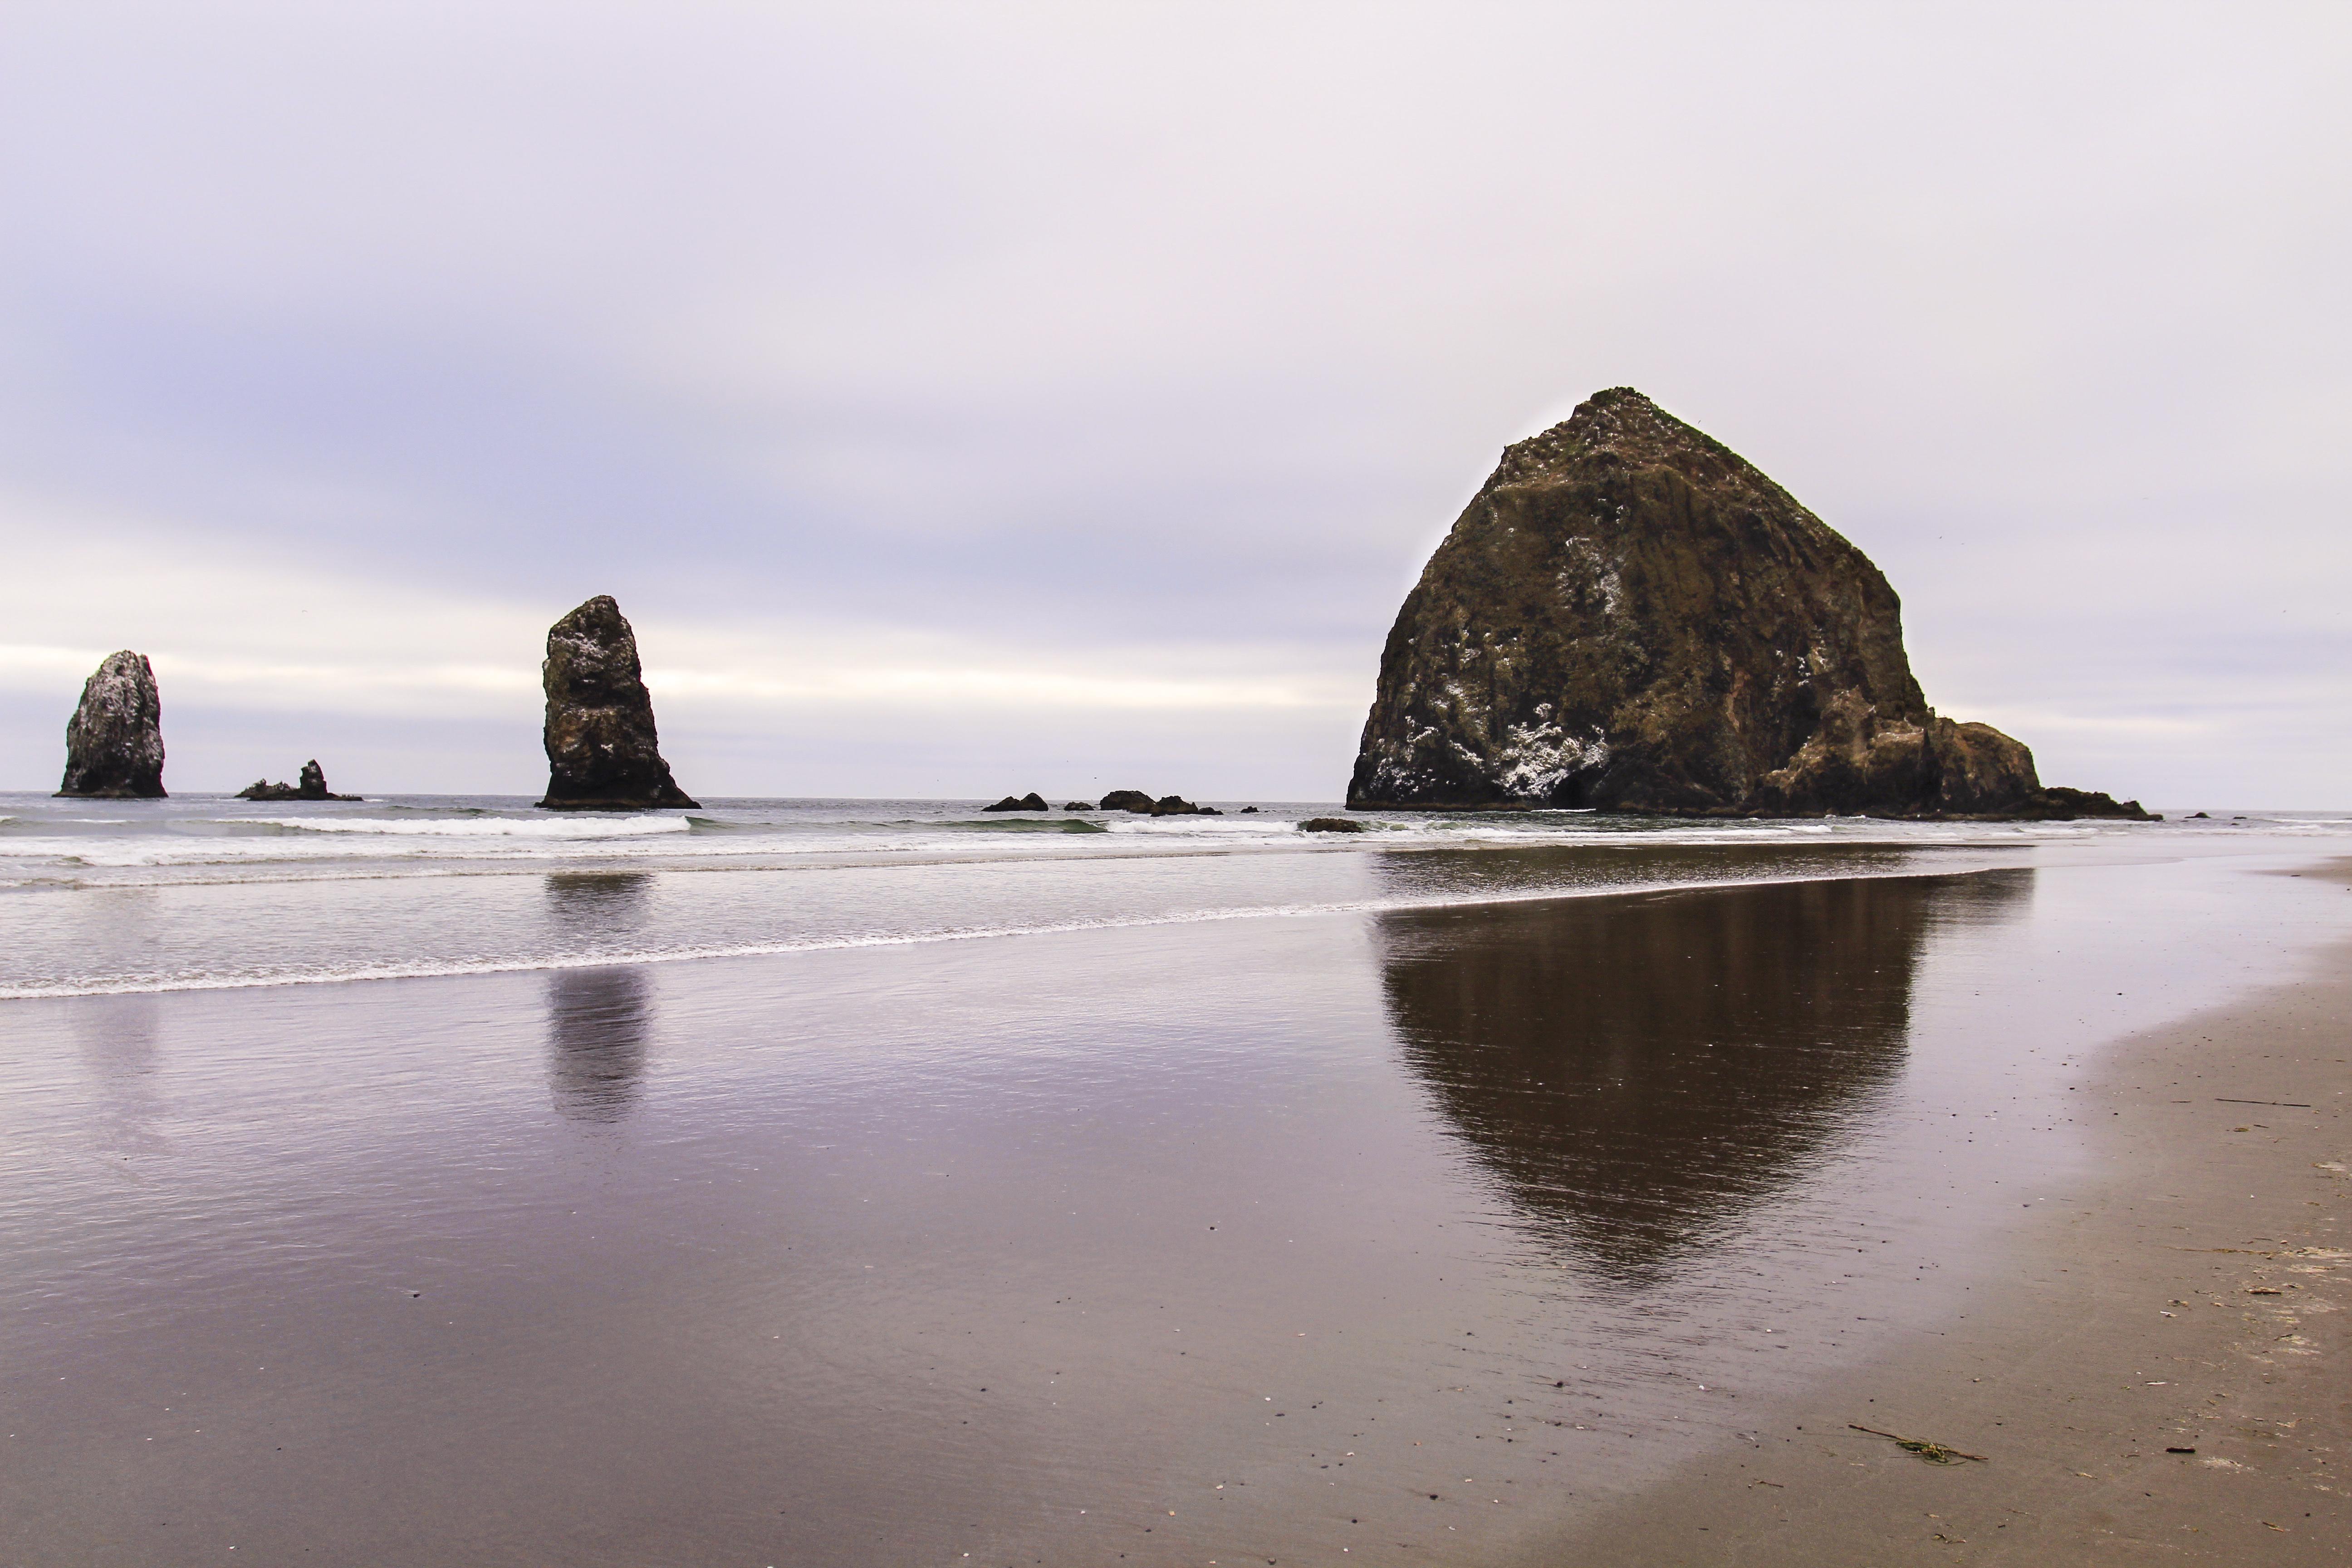 Cannon Beach Oregon, Rocks, Rock, Sand, Sea, HQ Photo